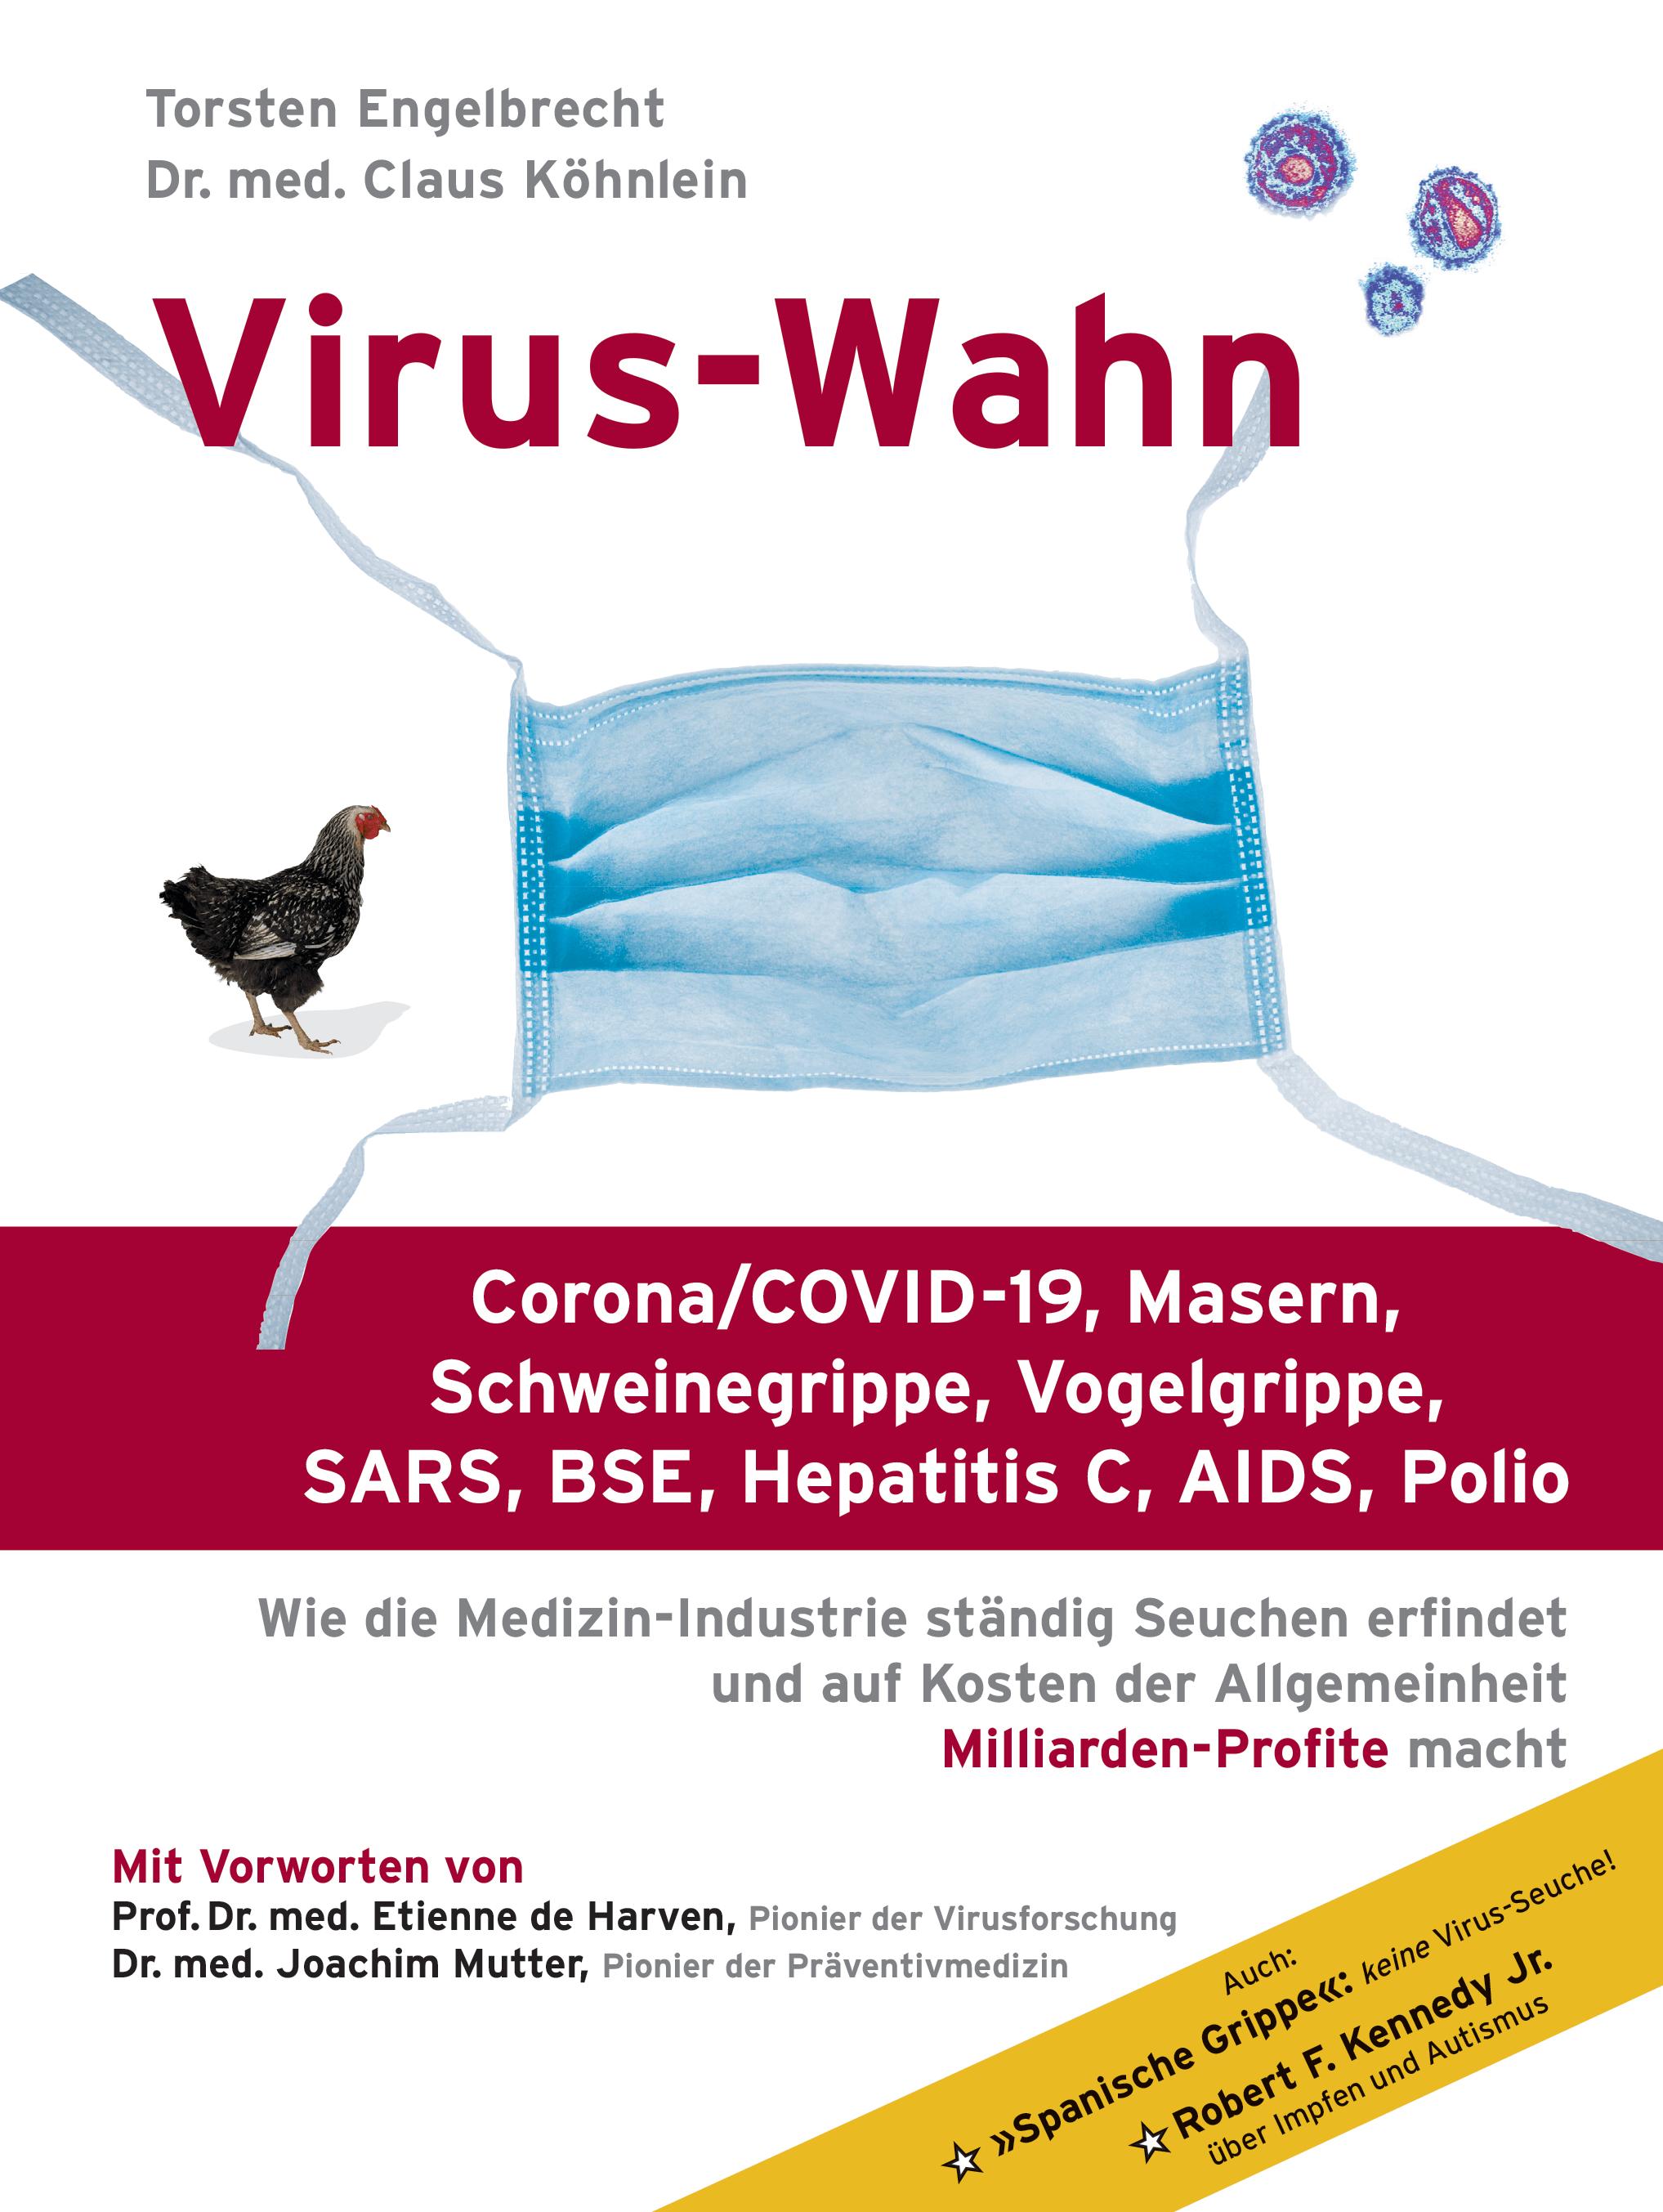 viruswahn_front